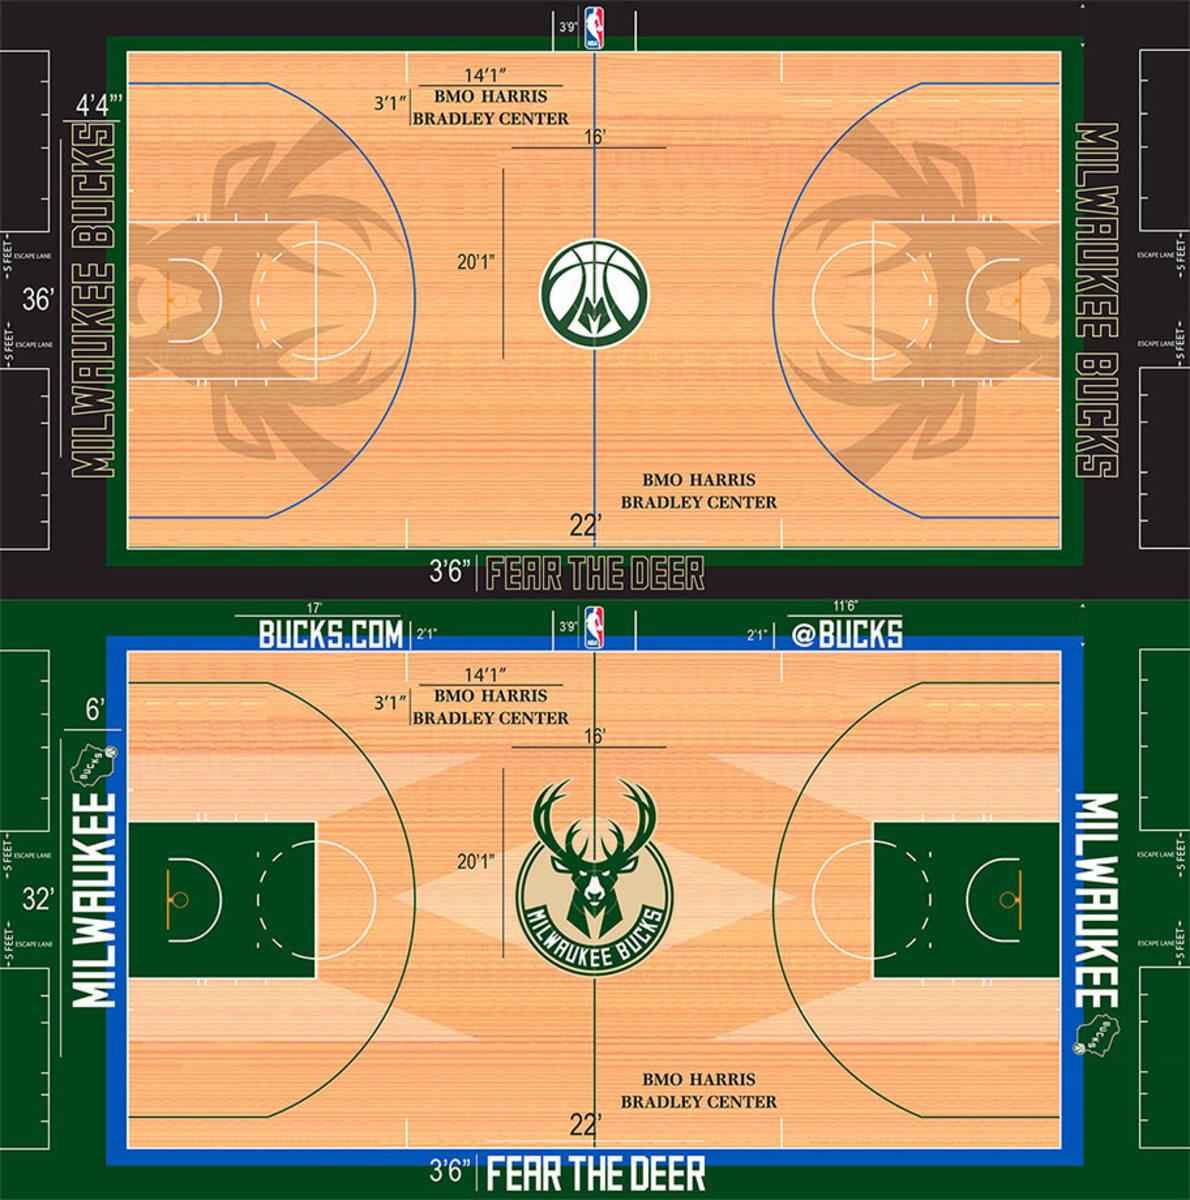 Milwaukee-Bucks-BMO-Harris-Bradley-Center-floors.jpg